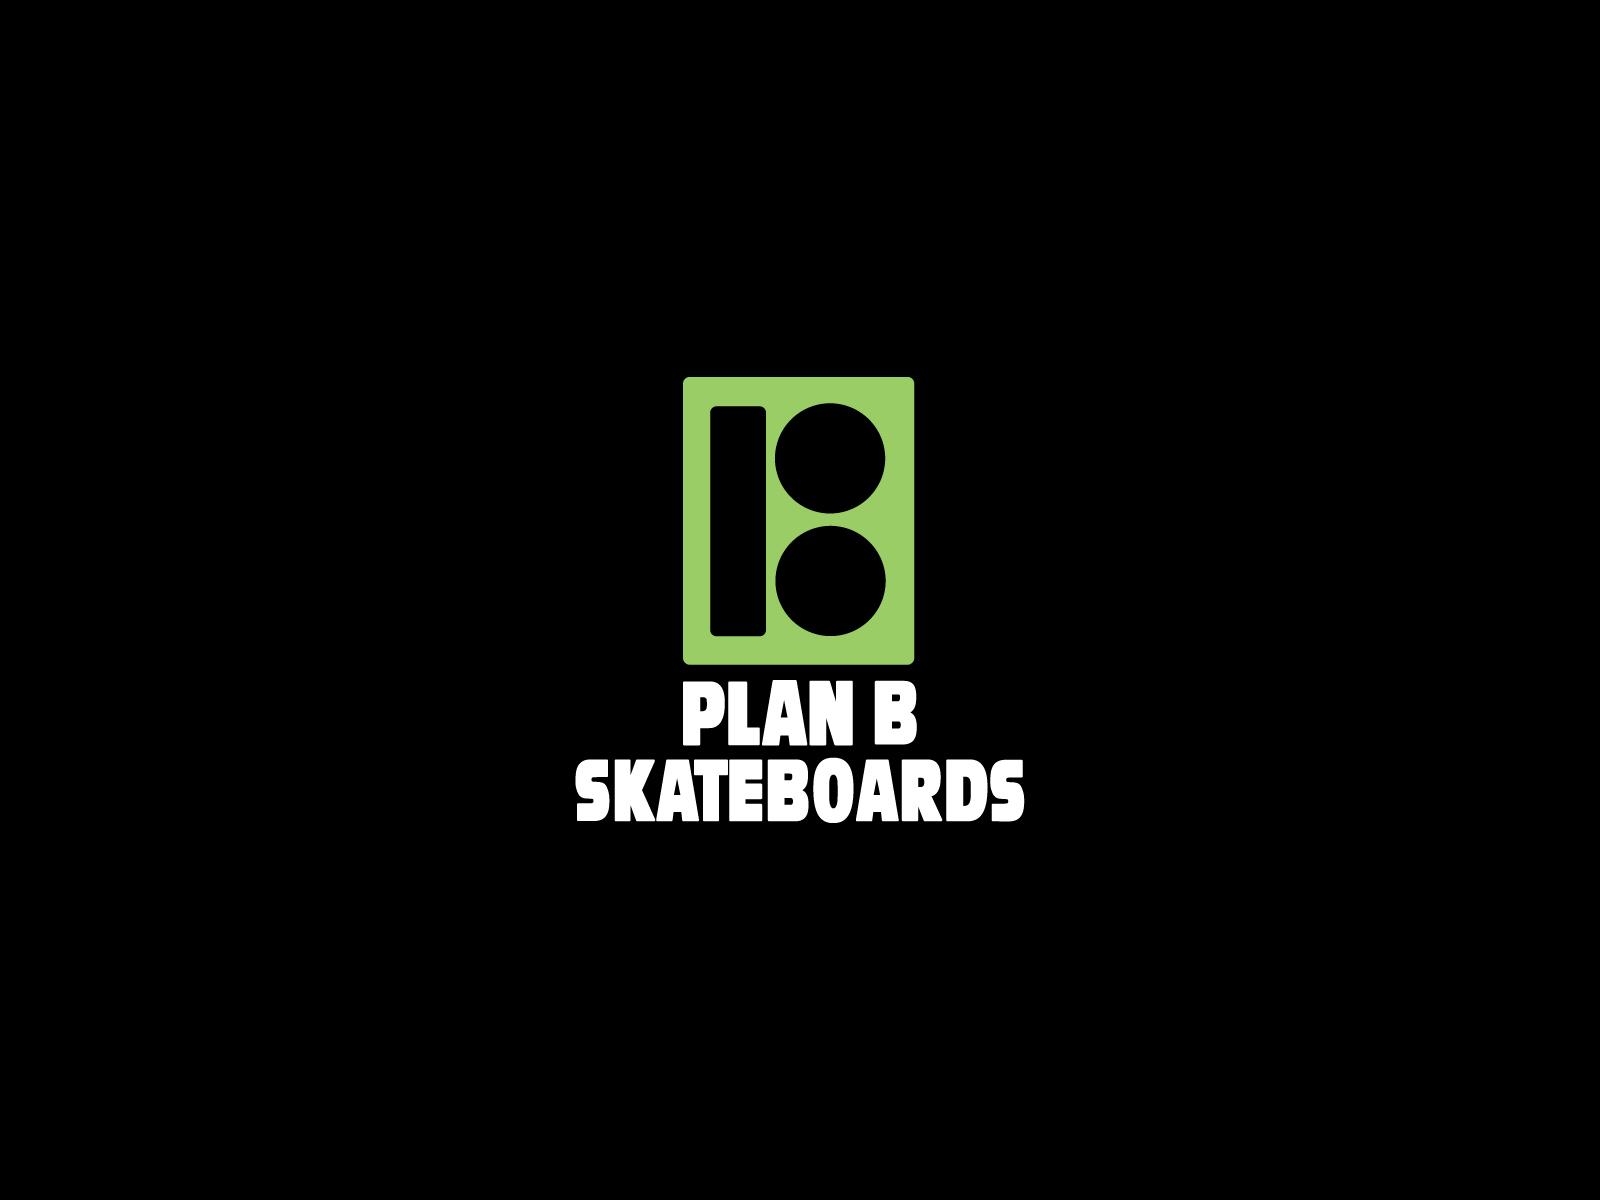 Skateboarding logos Skateboarding wallpapers skateboard wallpapers 1600x1200